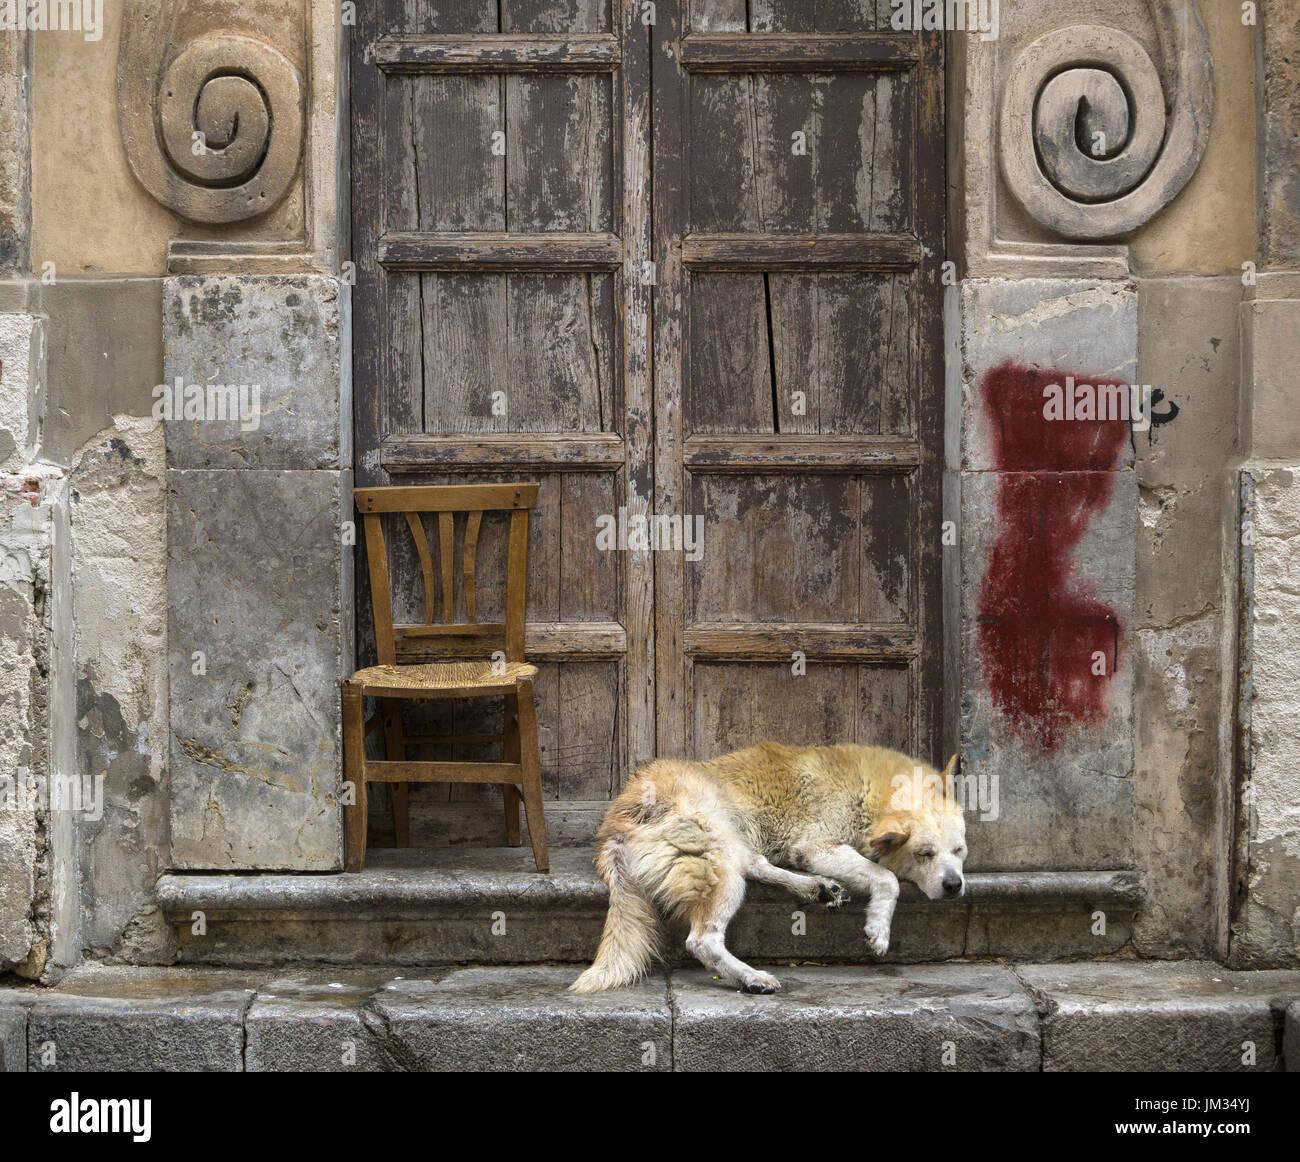 Sleeping dog in a Baroque church doorway, in the Via Porto Carini, Capo market, Central Palermo. - Stock Image